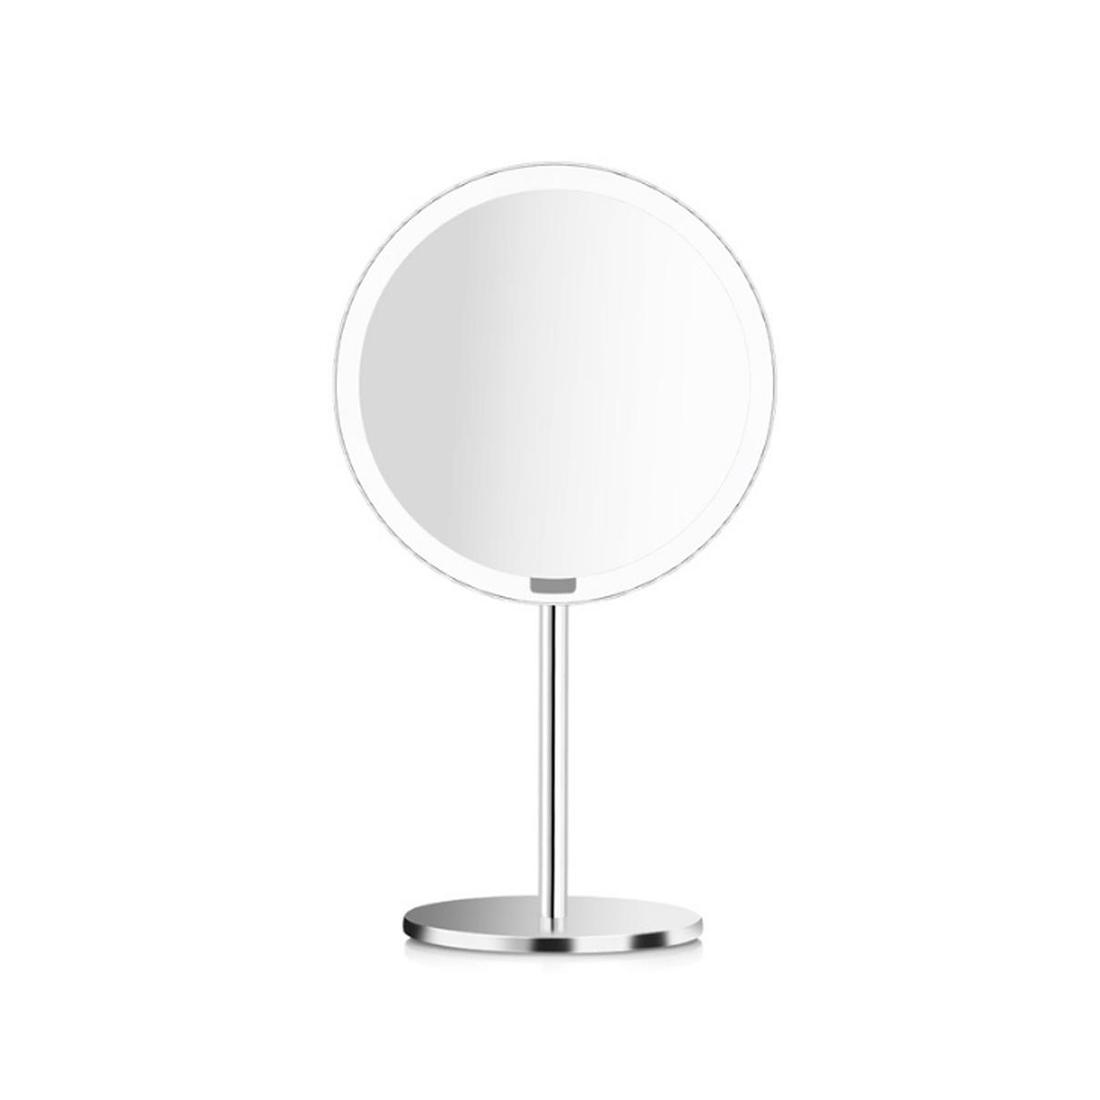 Настольное зеркало Xiaomi Yeelight LED Lighting Mirror